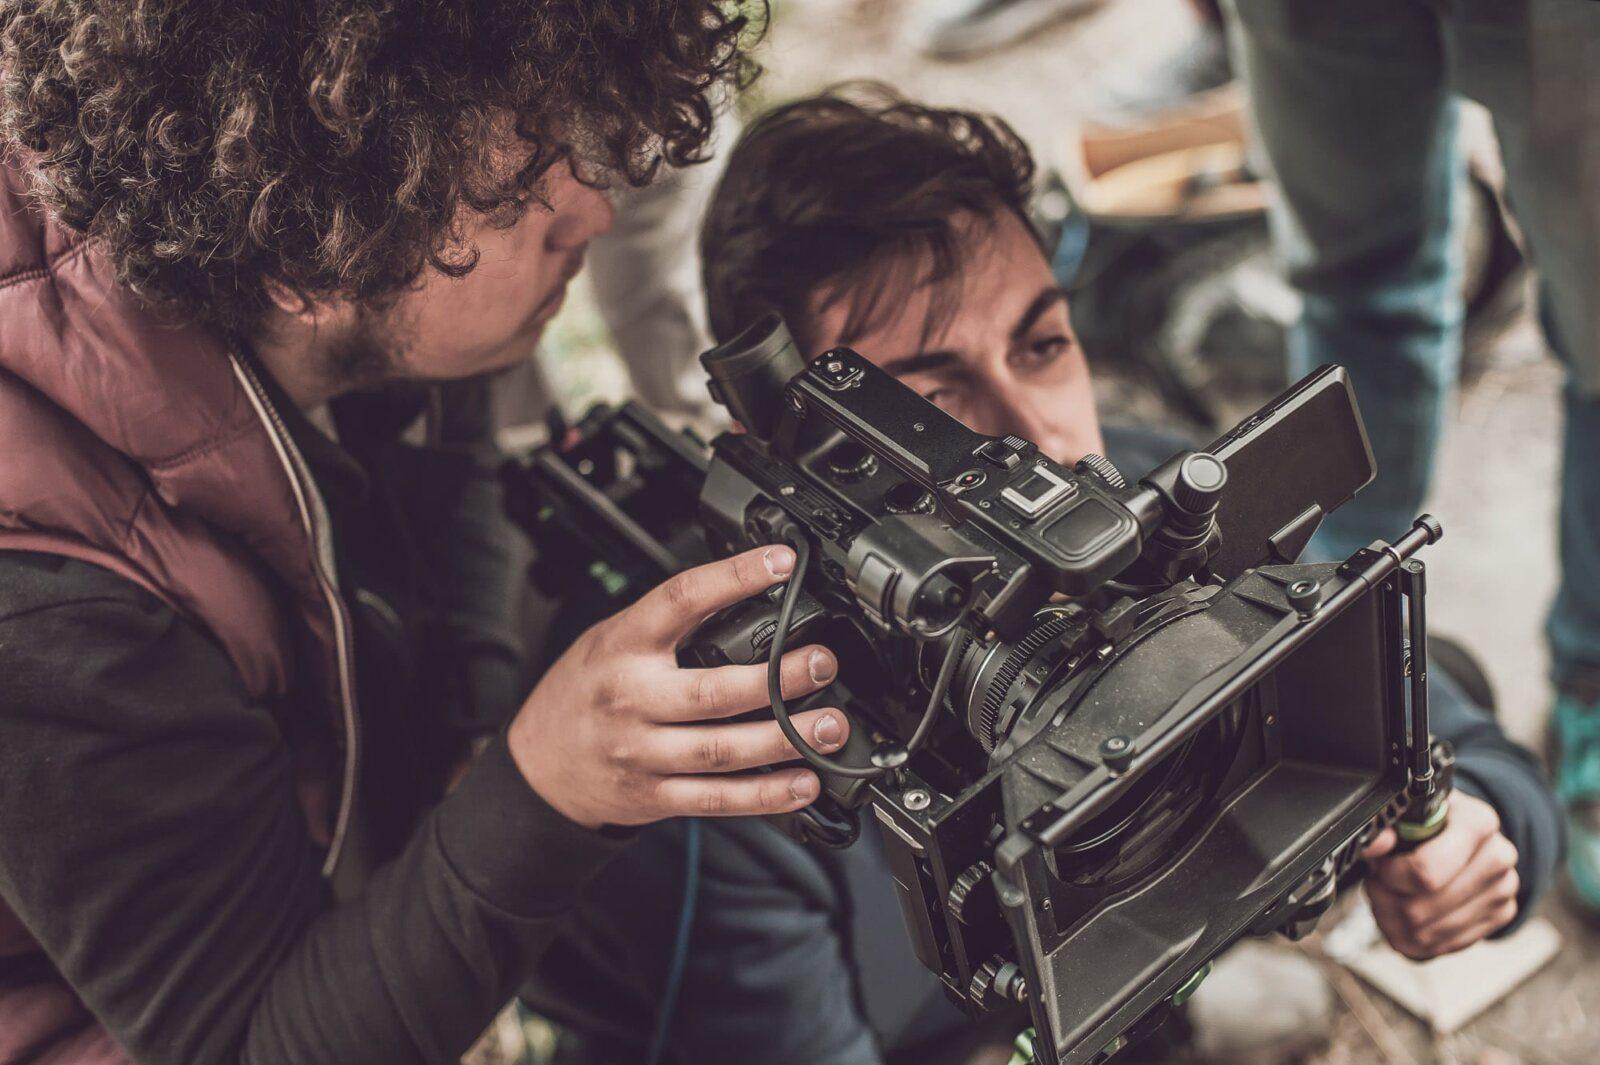 Media and camera